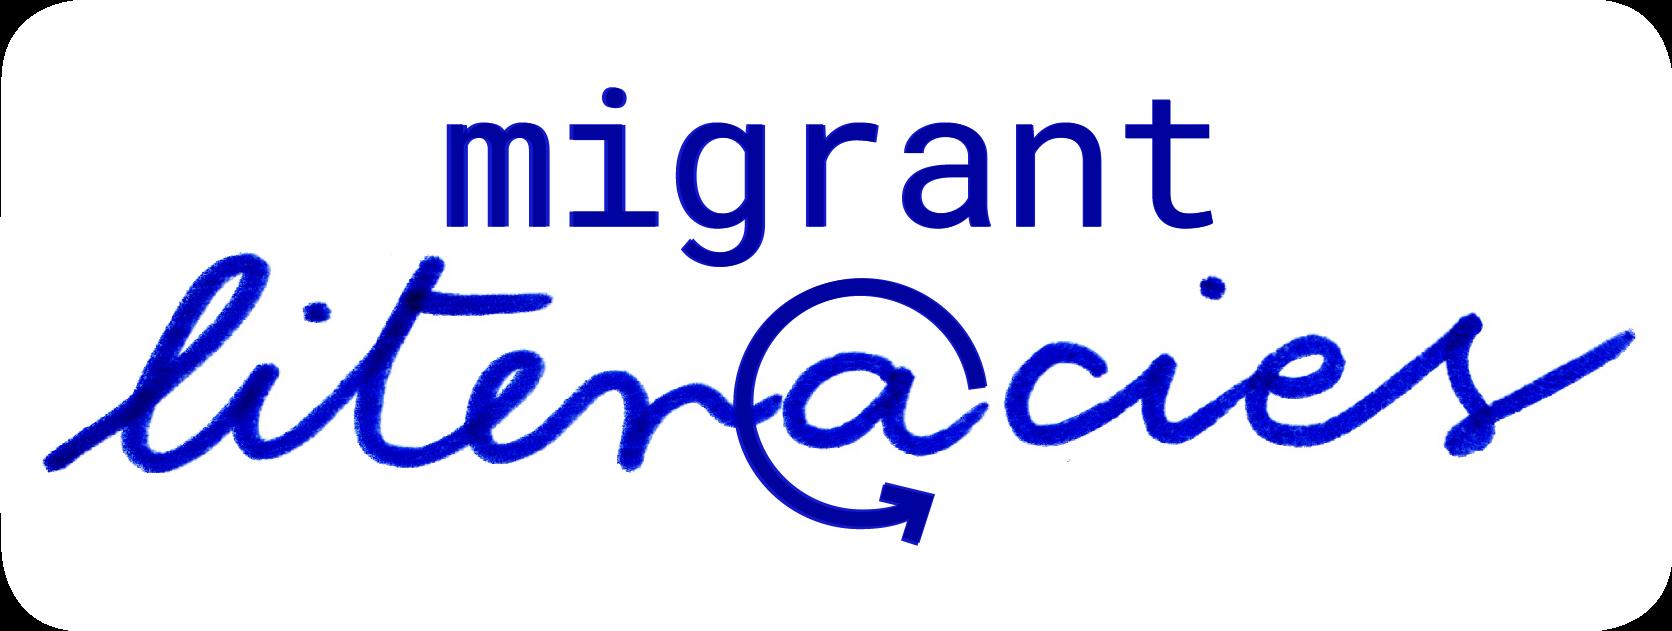 Migrant Literacies